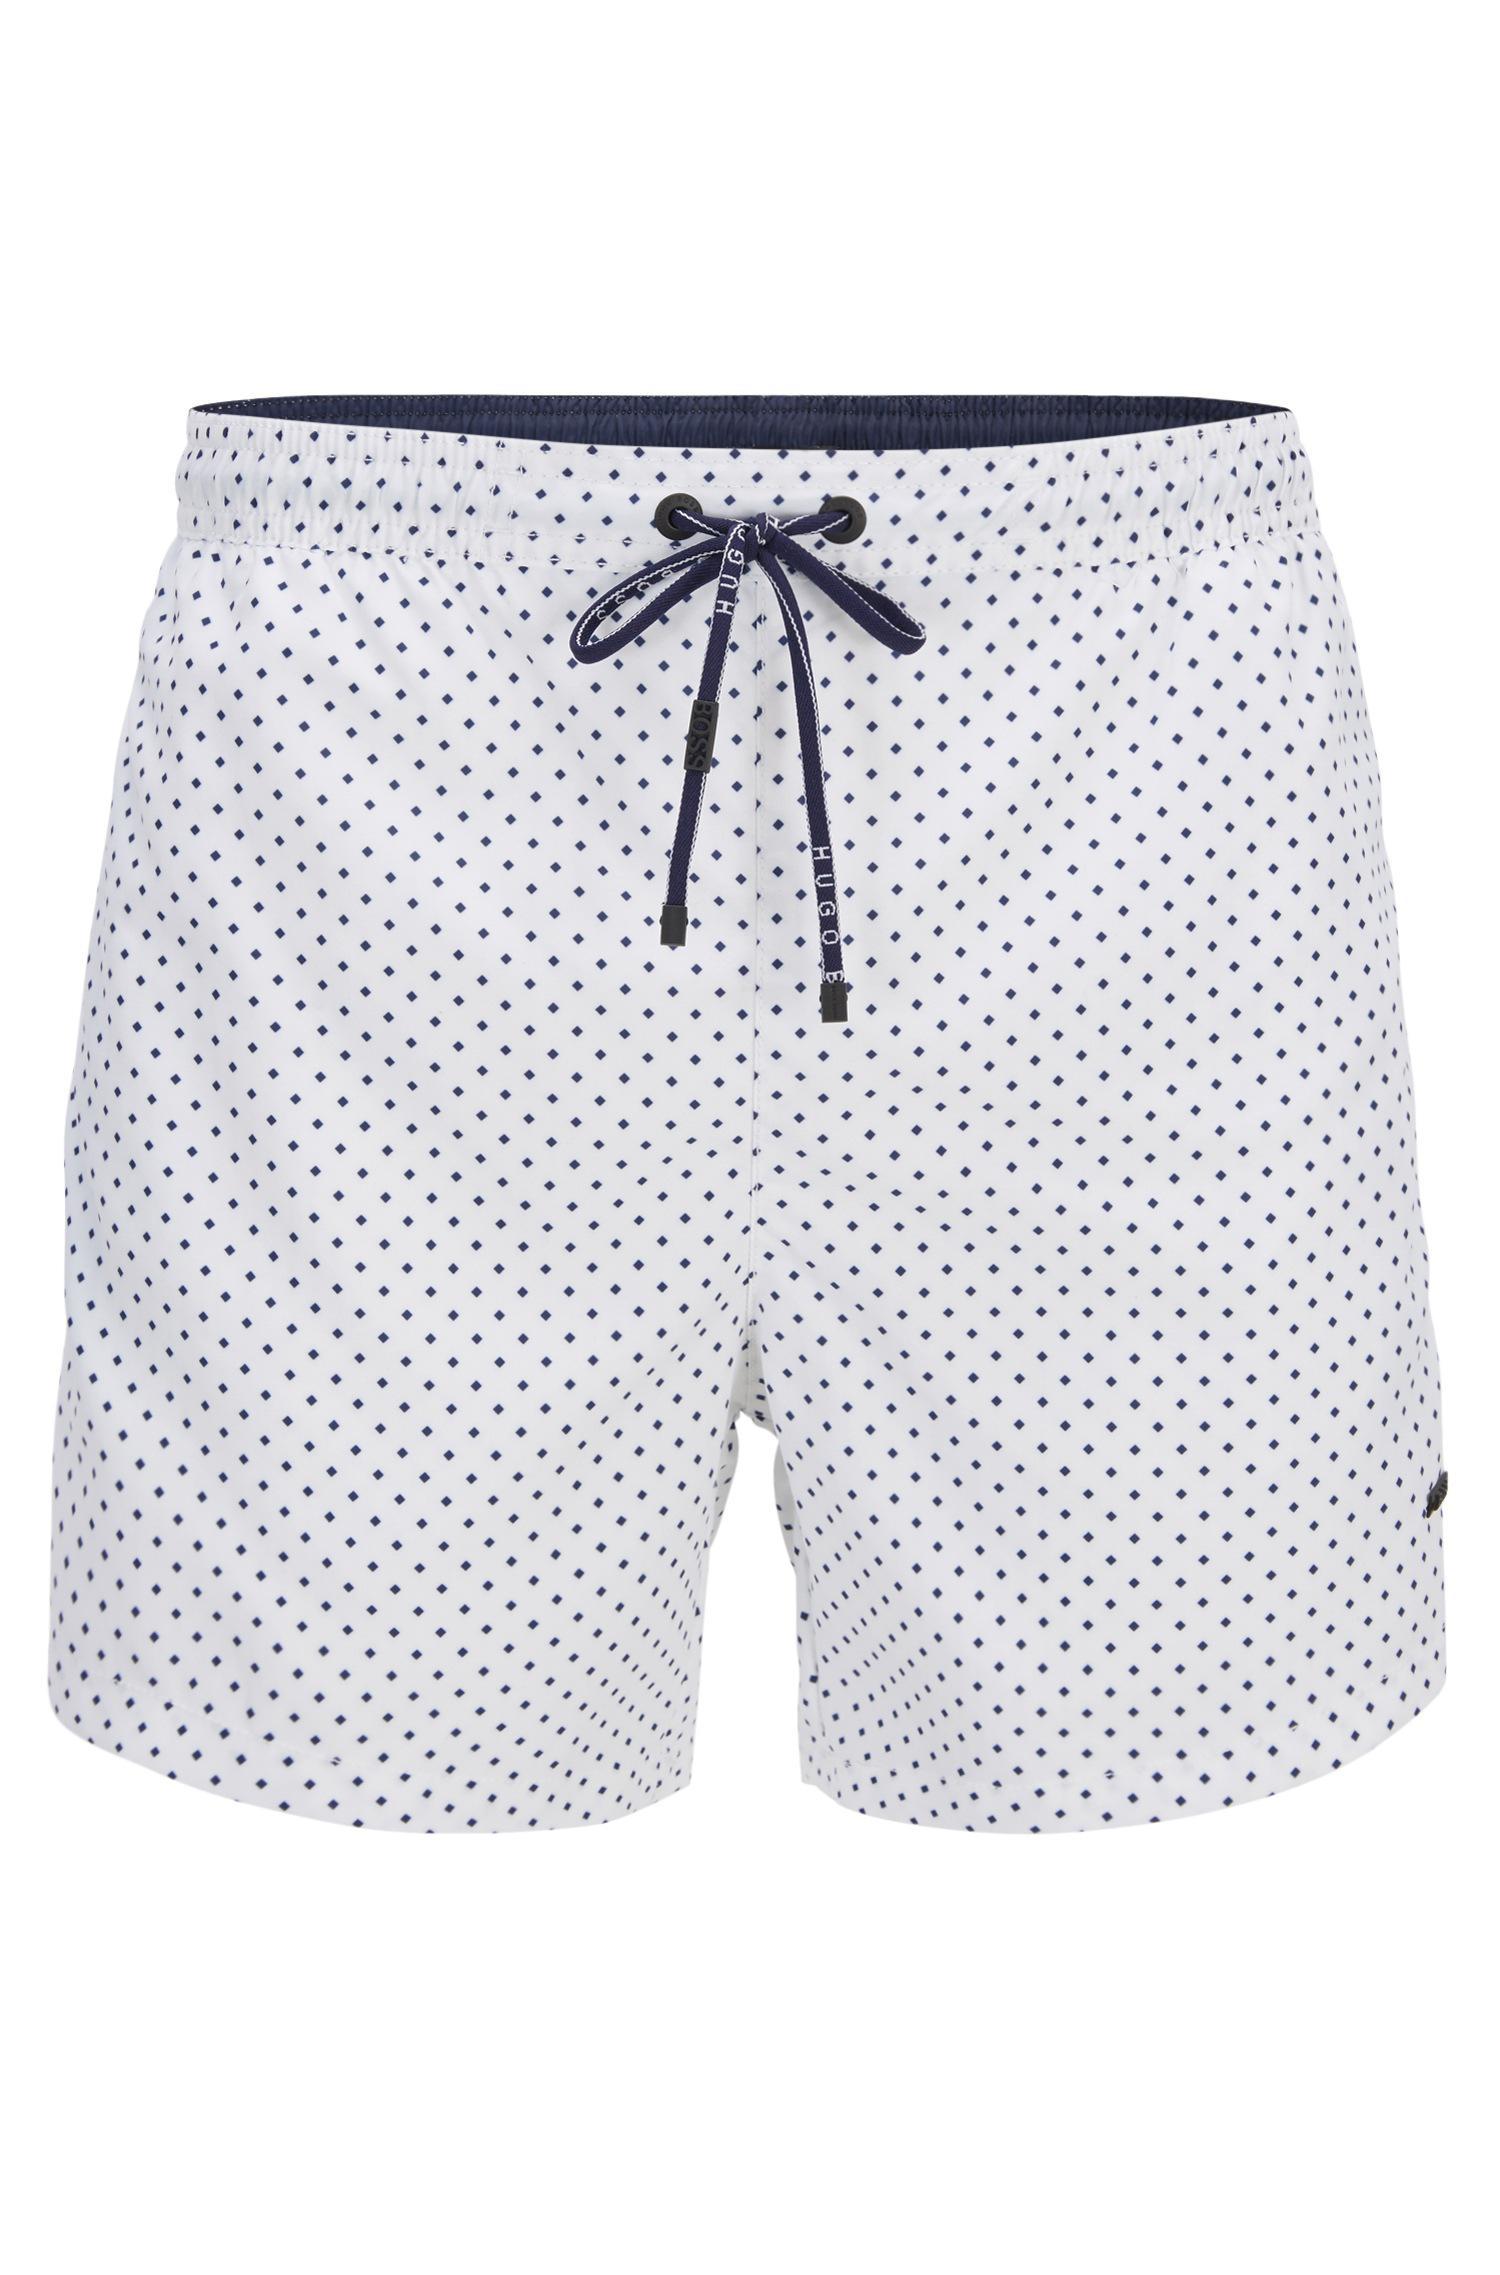 a0f6b5041e526 Boss Micro-pattern Swim Shorts In Quick-drying Technical Fabric in ...